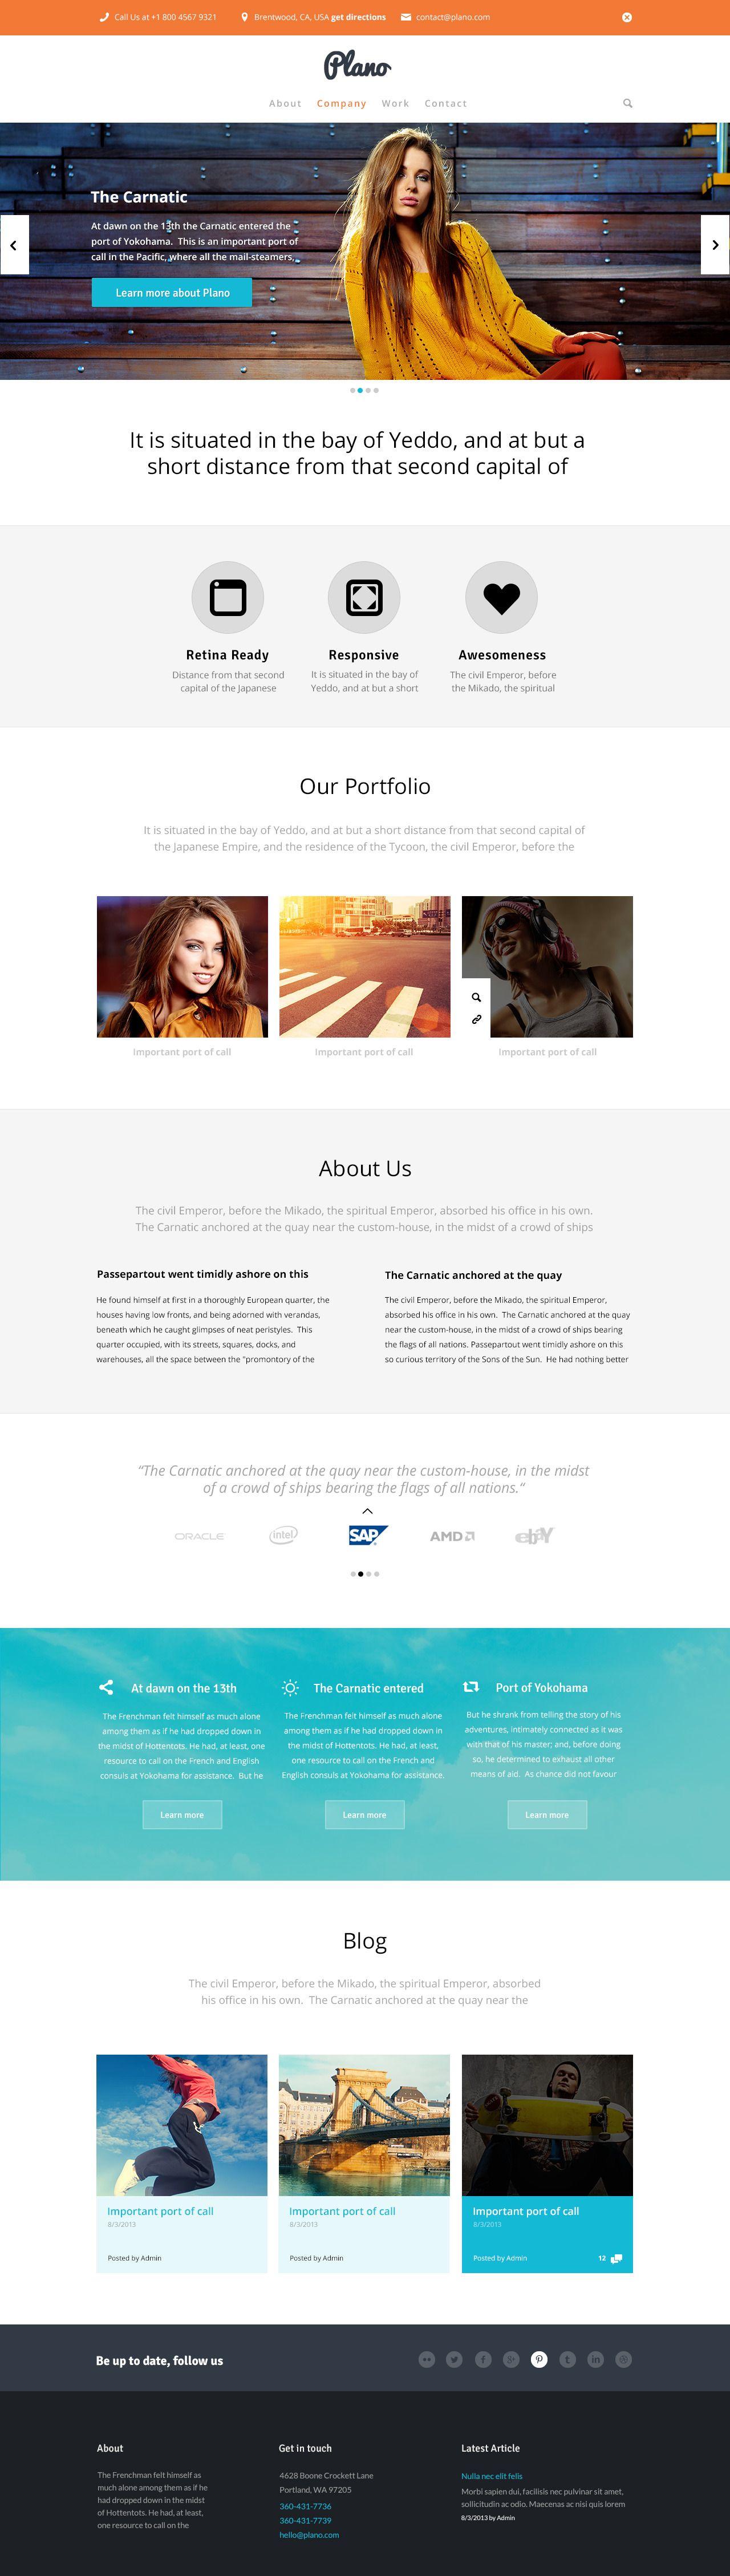 Coderra Ltd Is A Cheshire Web Design Company Near Nantwich Whitchurch Crewe And Chester Coderra Clean Web Design Small Business Web Design Best Web Design